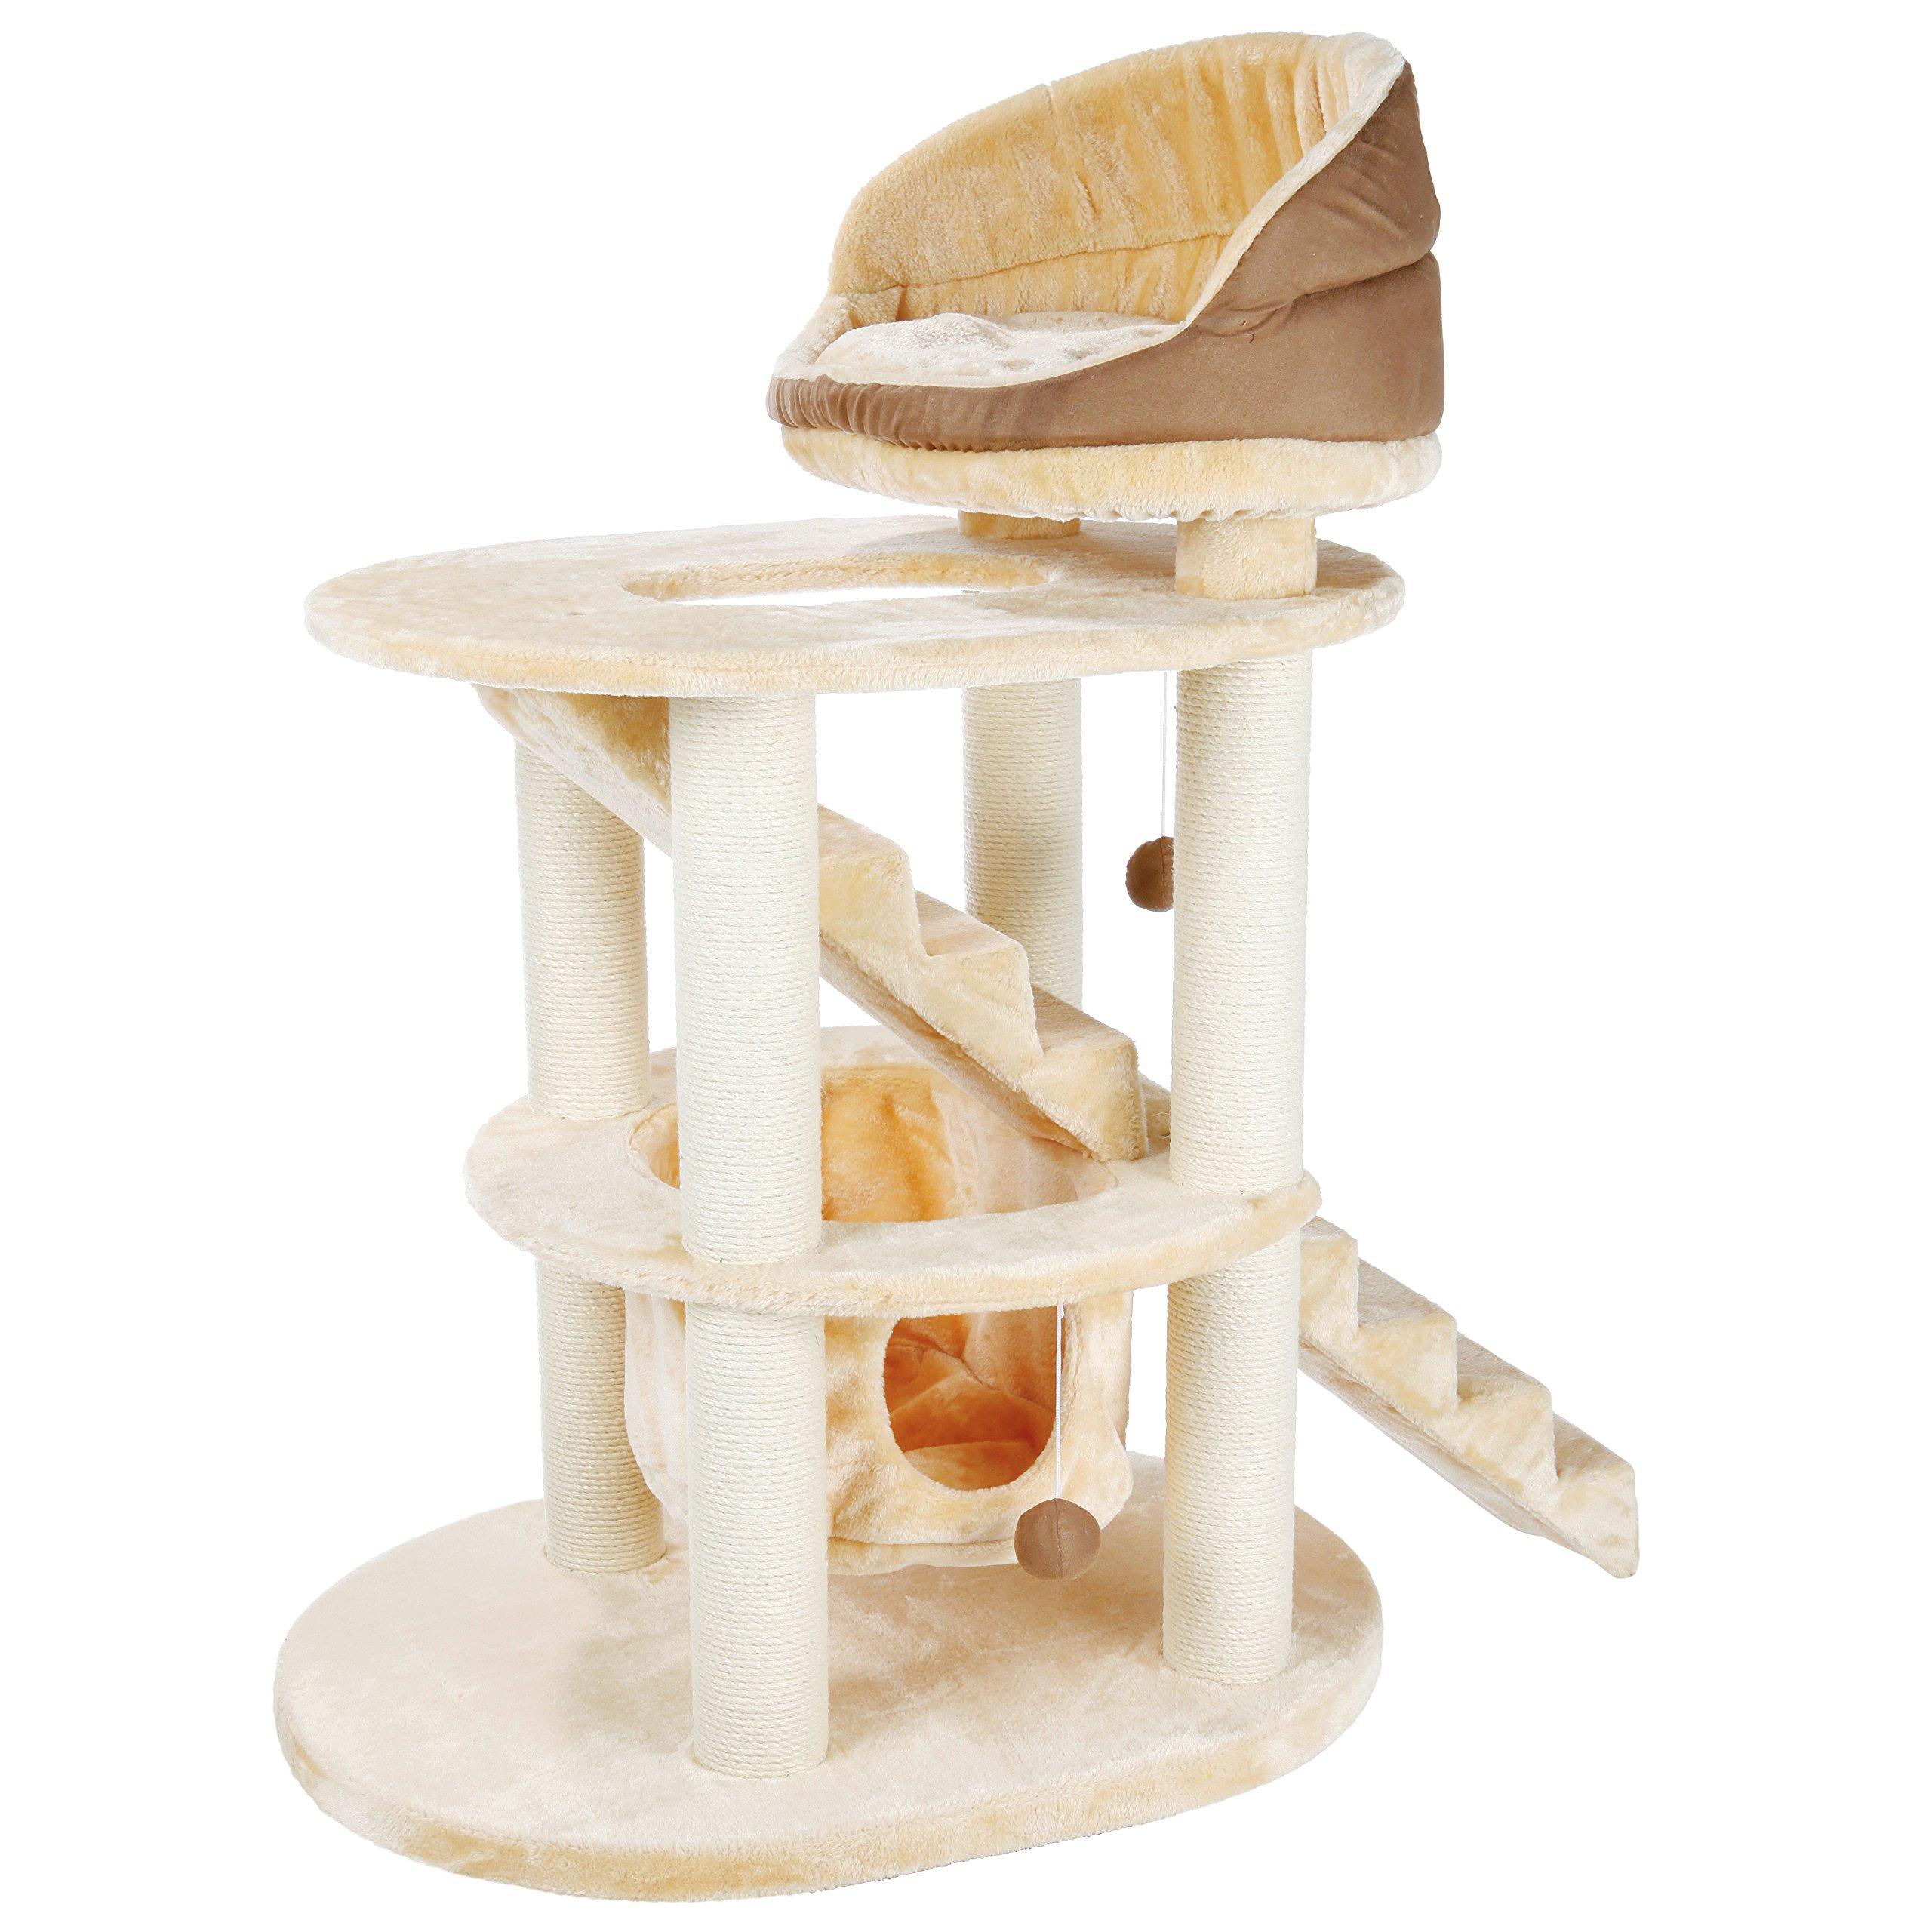 Trixie Pet Products Elsa Senior Cat Playground